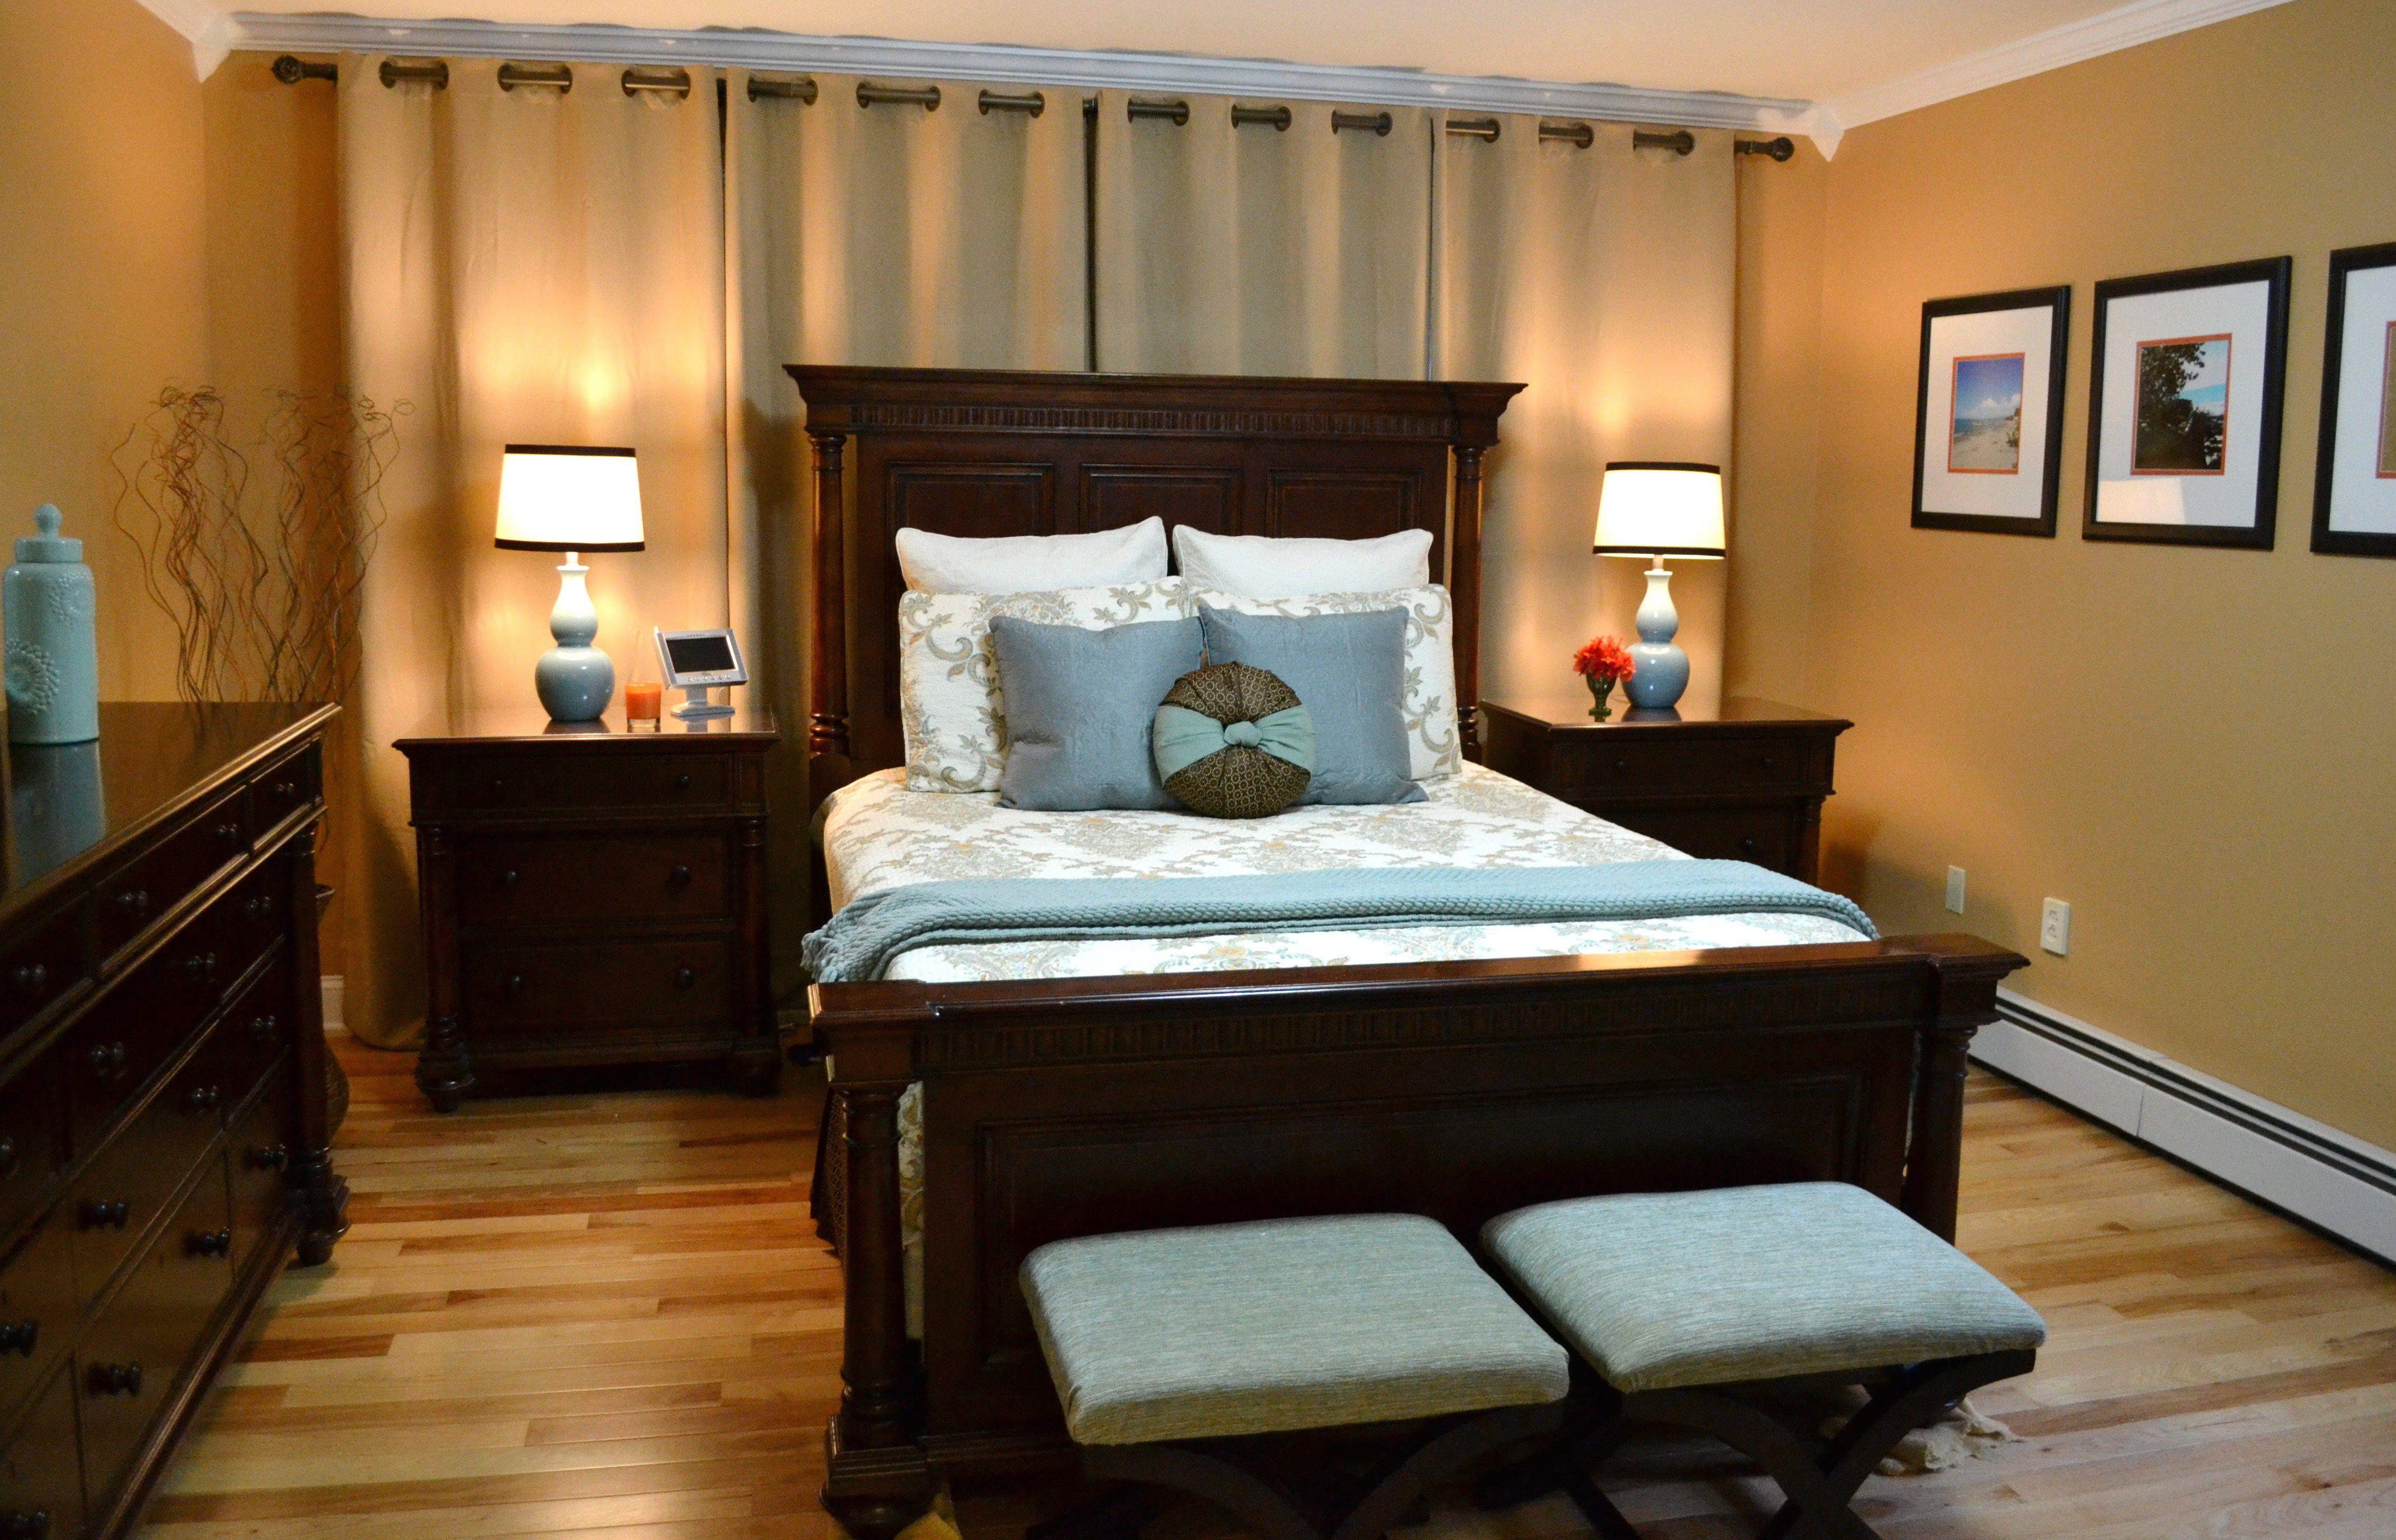 curtains behind bed bedroom design